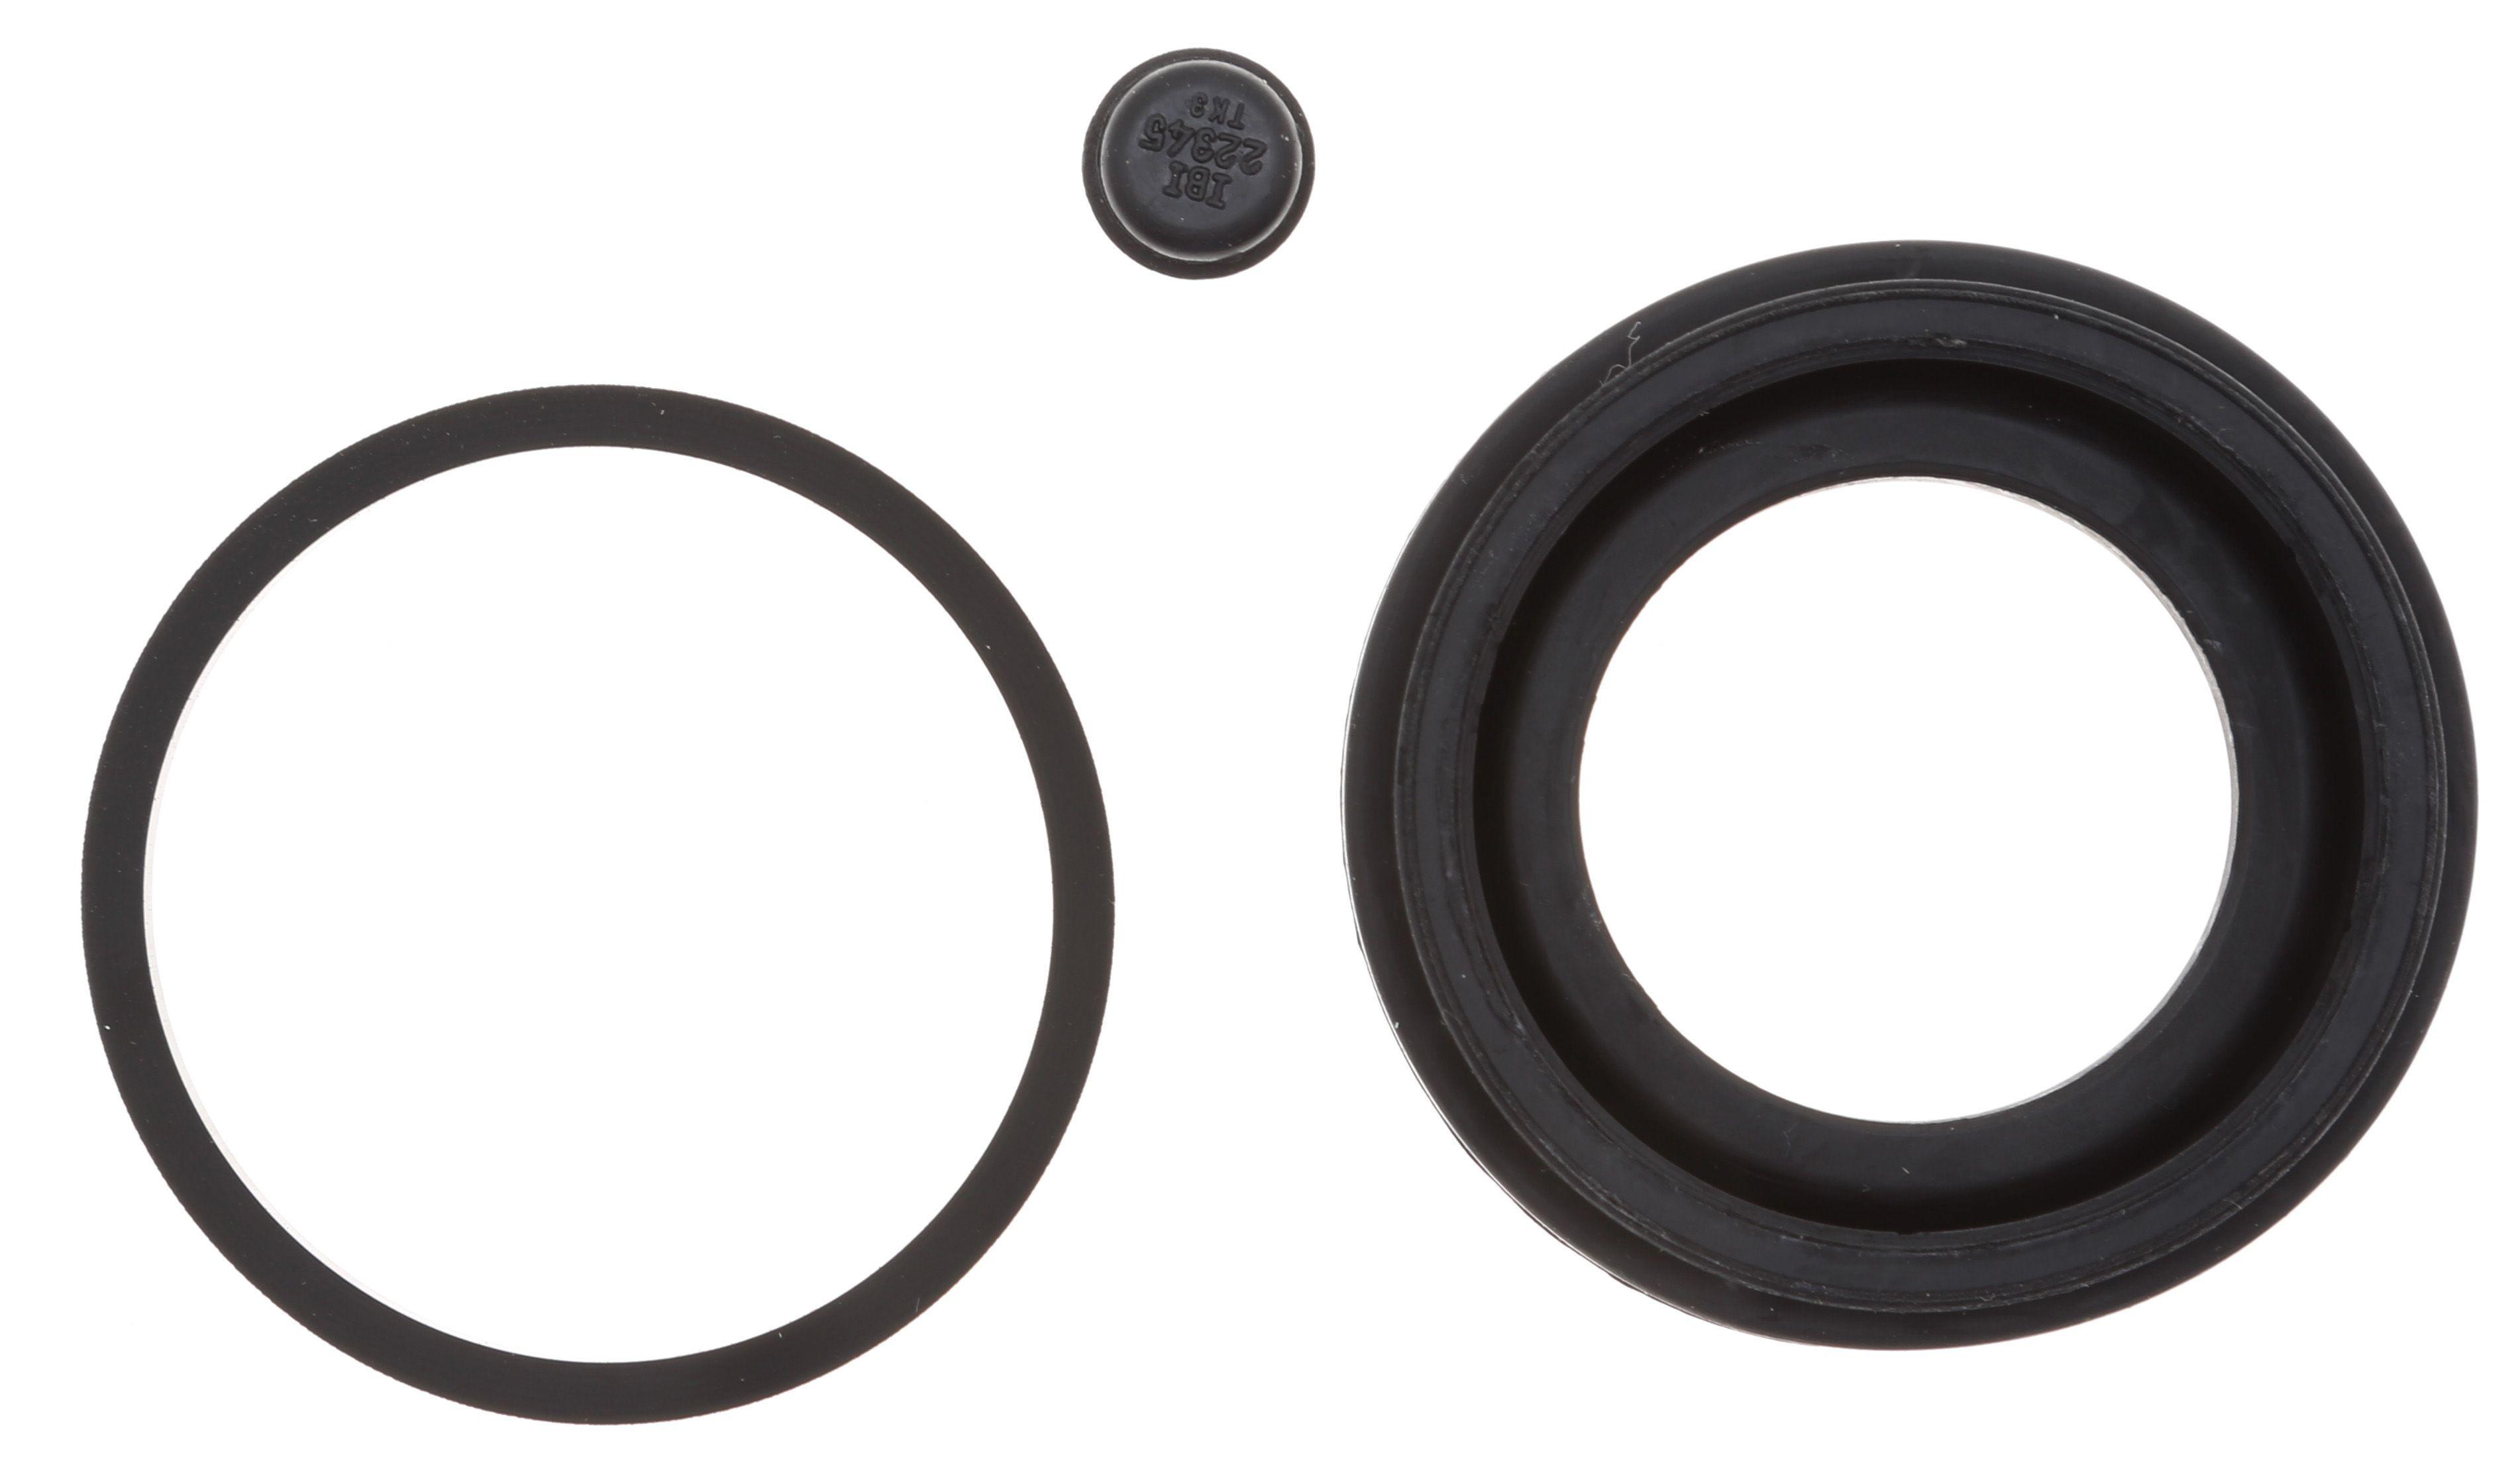 ACDELCO GOLD/PROFESSIONAL BRAKES - Disc Brake Caliper Seal Kit (Rear) - ADU 18G3300